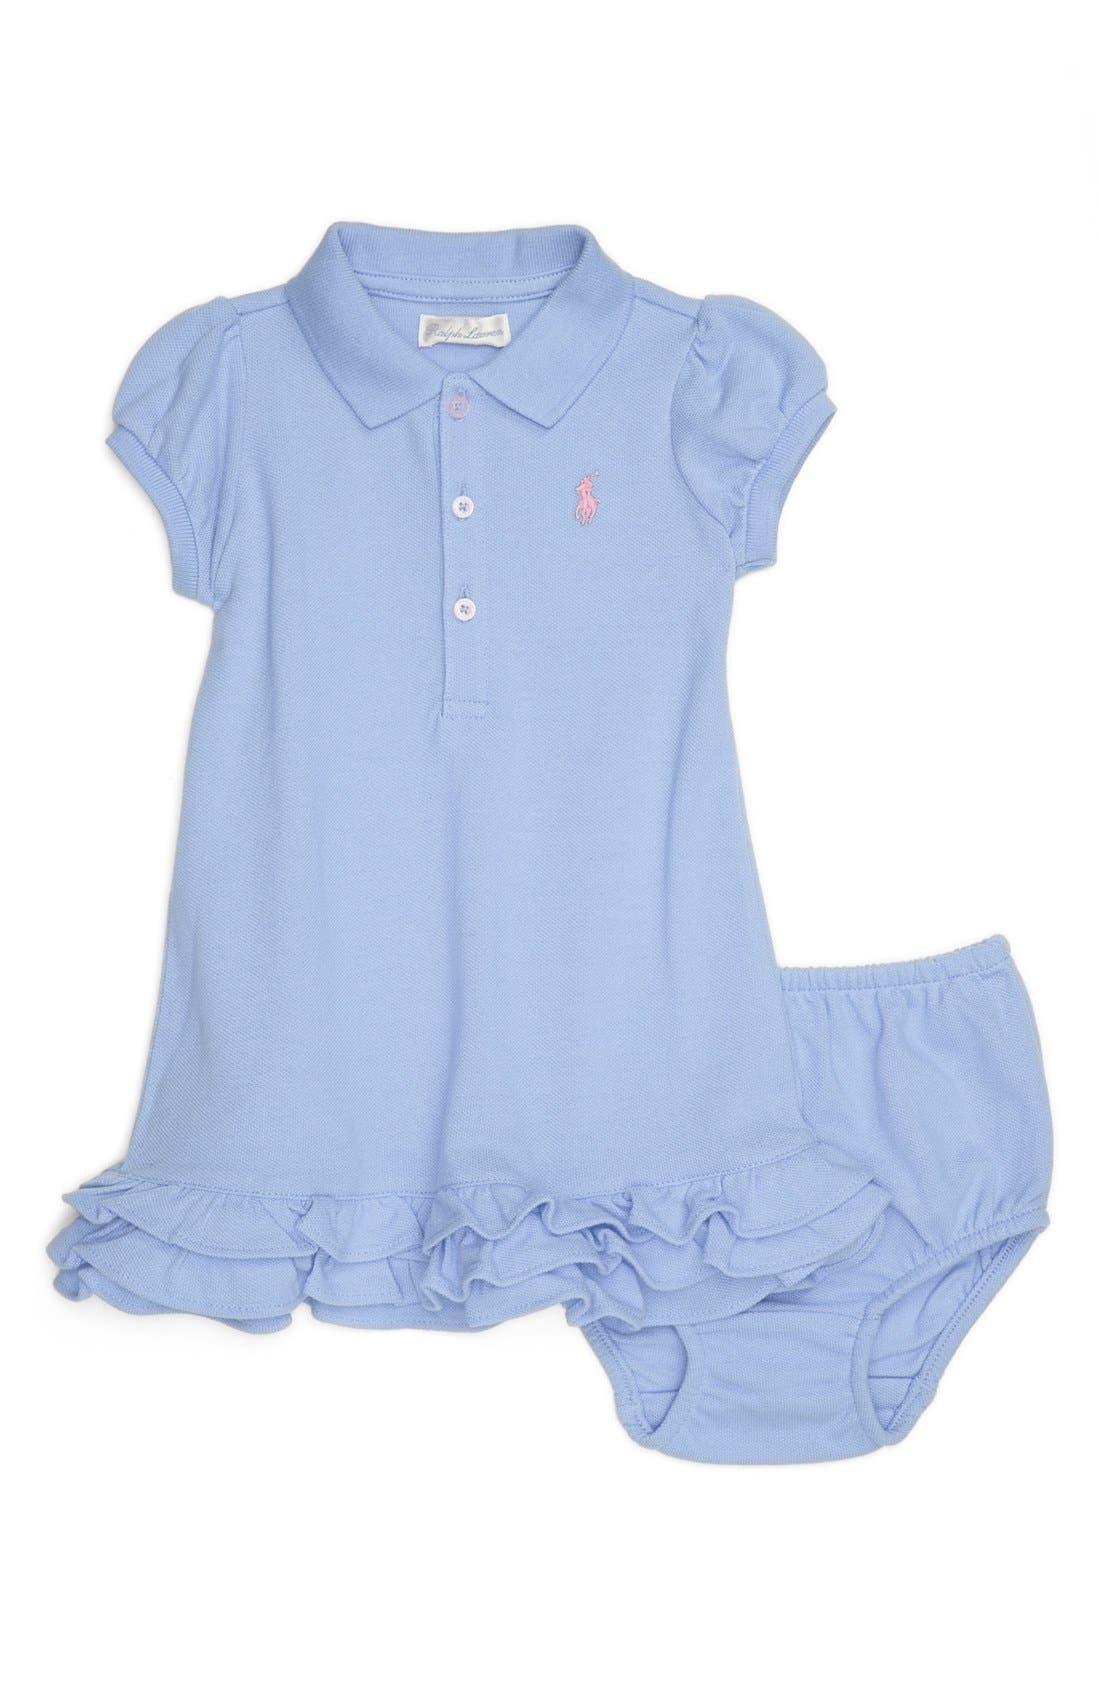 Main Image - Ralph Lauren Polo Dress & Bloomers (Baby Girls)